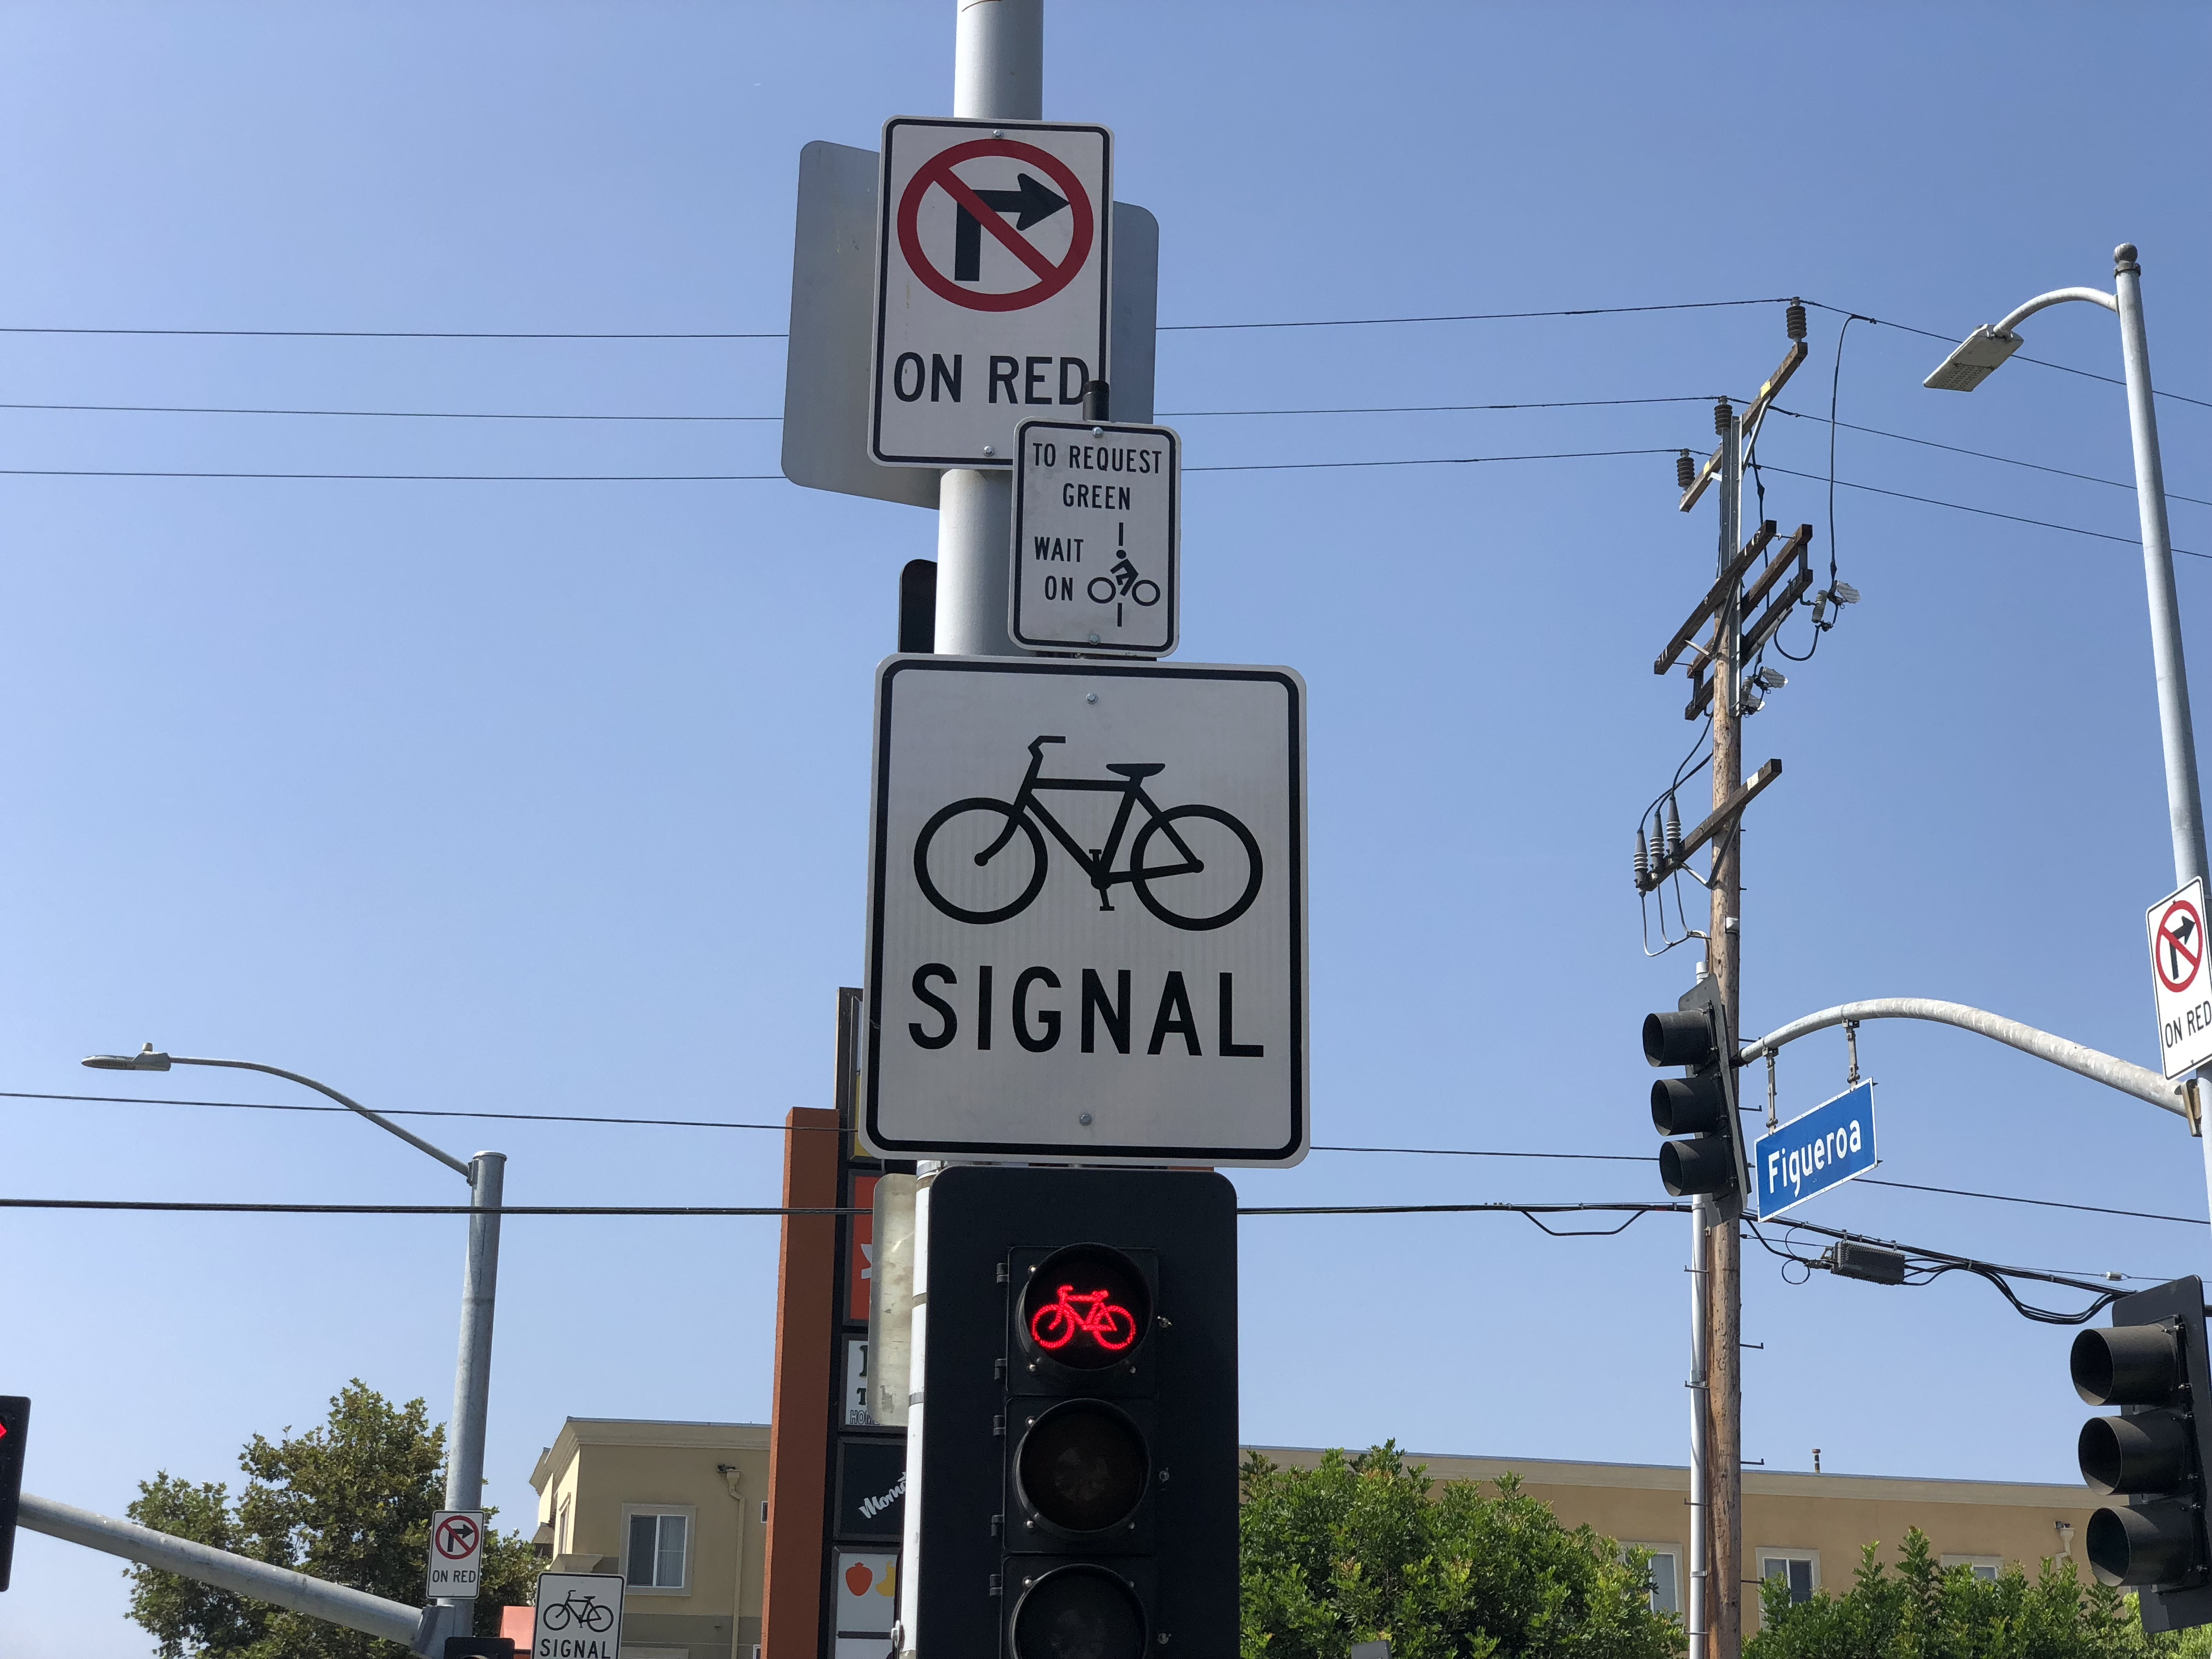 Bike traffic signals los angeles